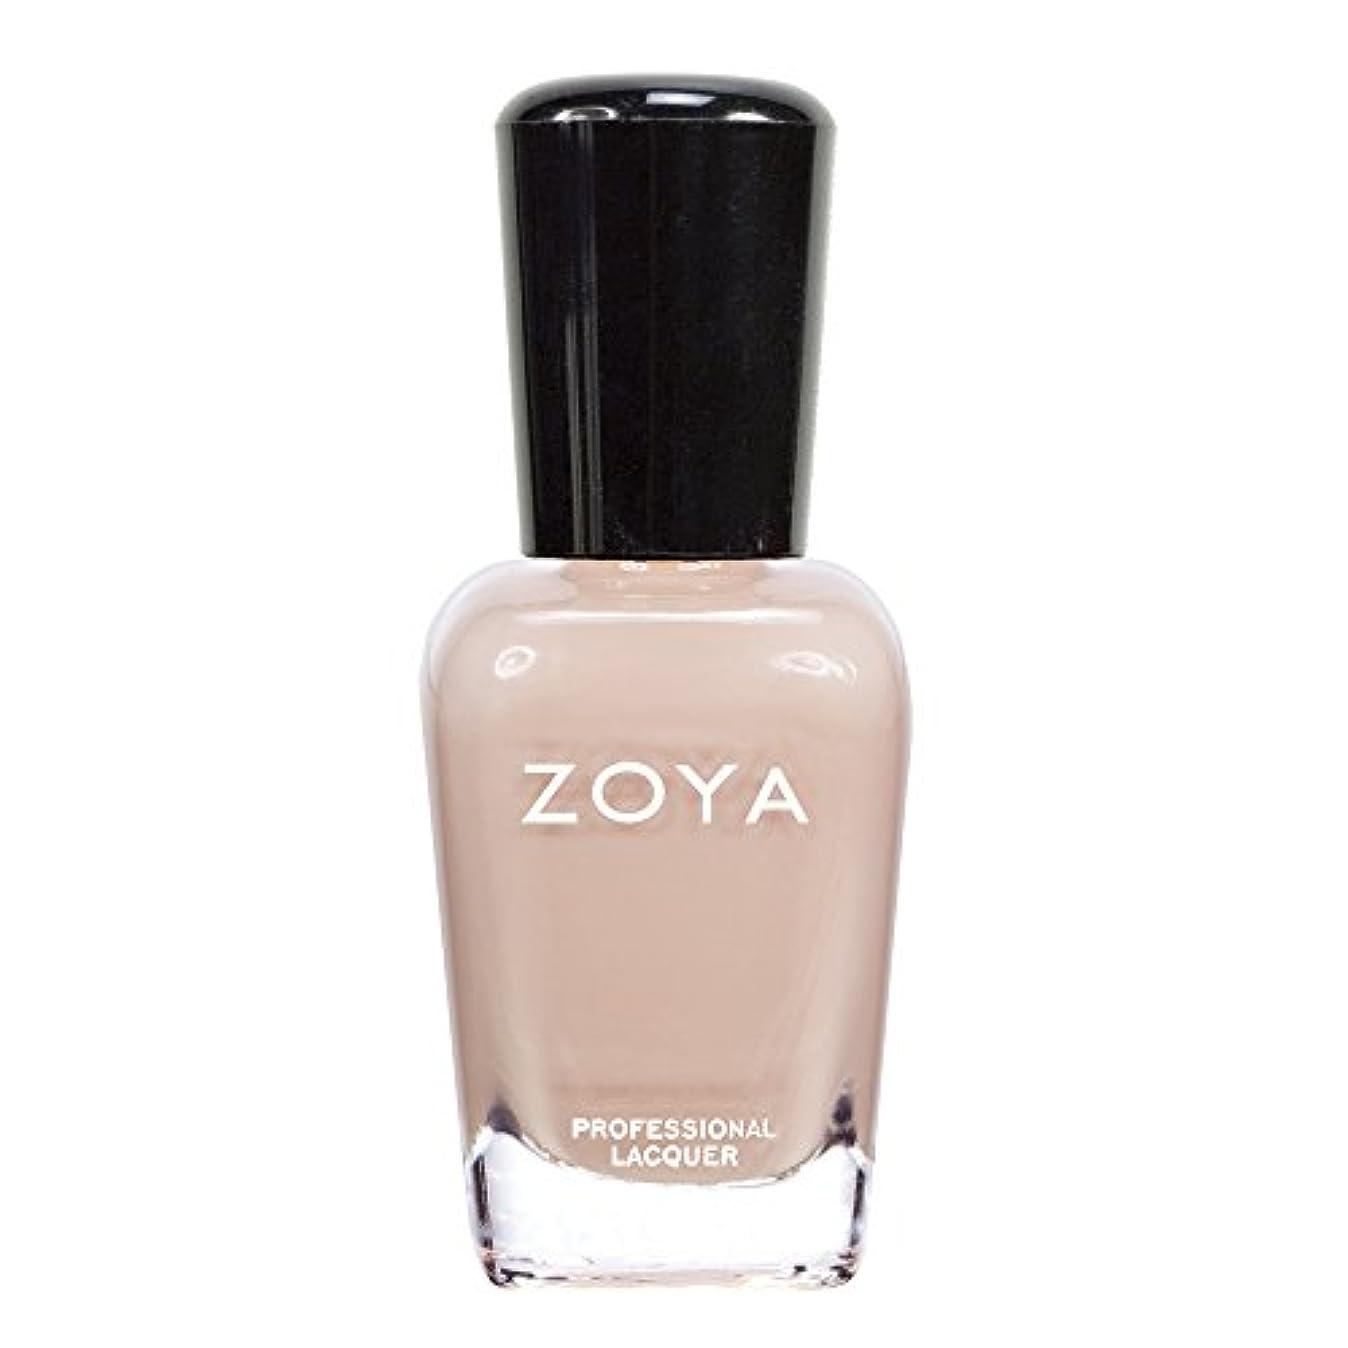 ZOYA ゾーヤ ネイルカラーZP596 AVERY エイブリィ 15ml 優しく色づくブロンドベージュ マット/クリーム 爪にやさしいネイルラッカーマニキュア